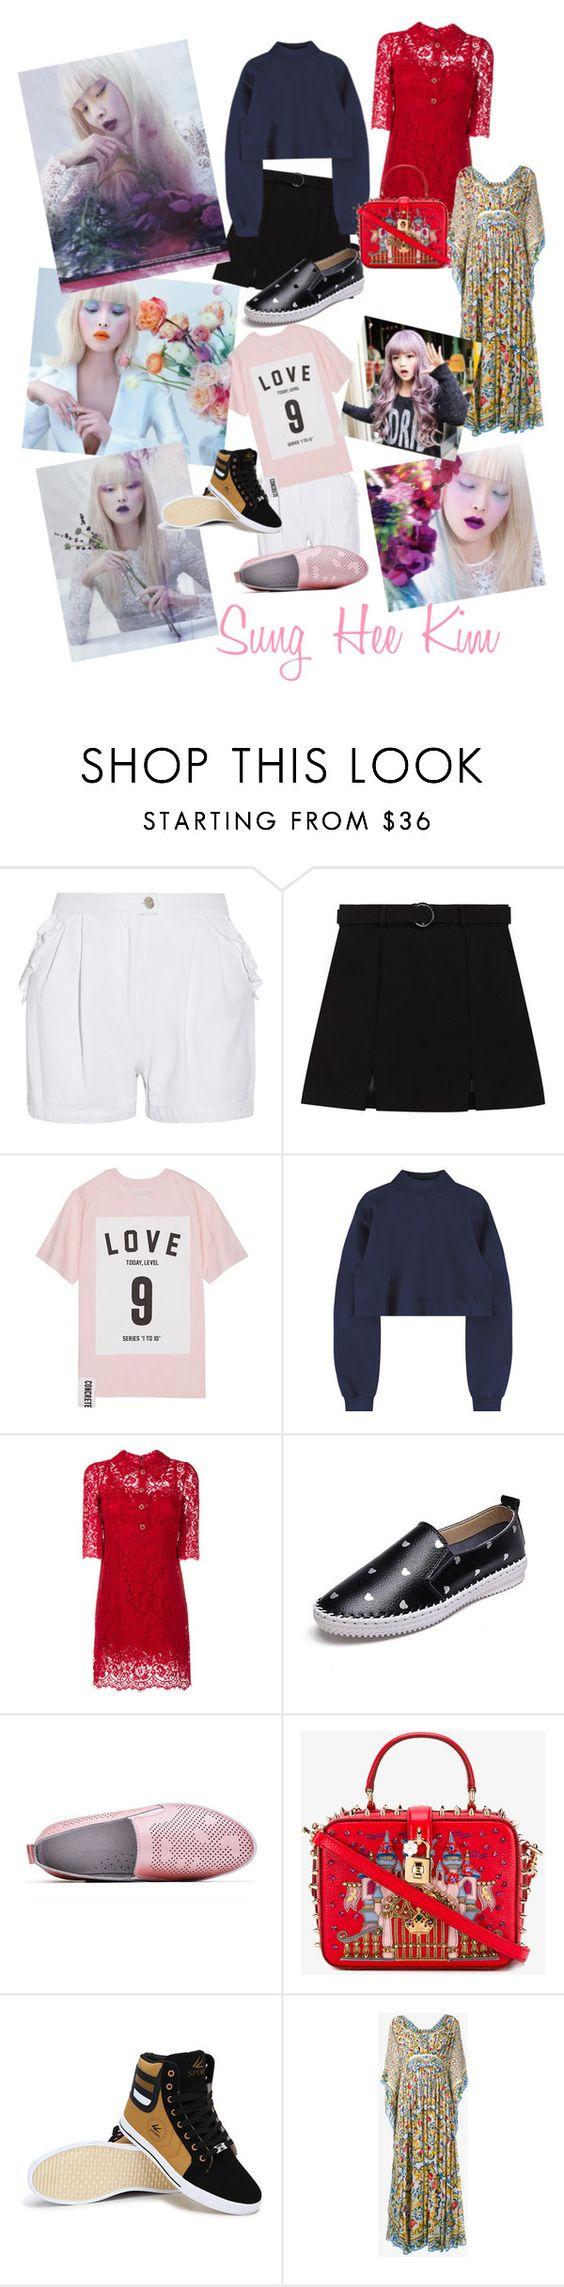 """Korean Inspired- Sung Hee Kim"" by maryann-bunt-deile ❤ liked on Polyvore featuring Steve J & Yoni P, Studio Concrete, Dolce&Gabbana and GABALMANIA"